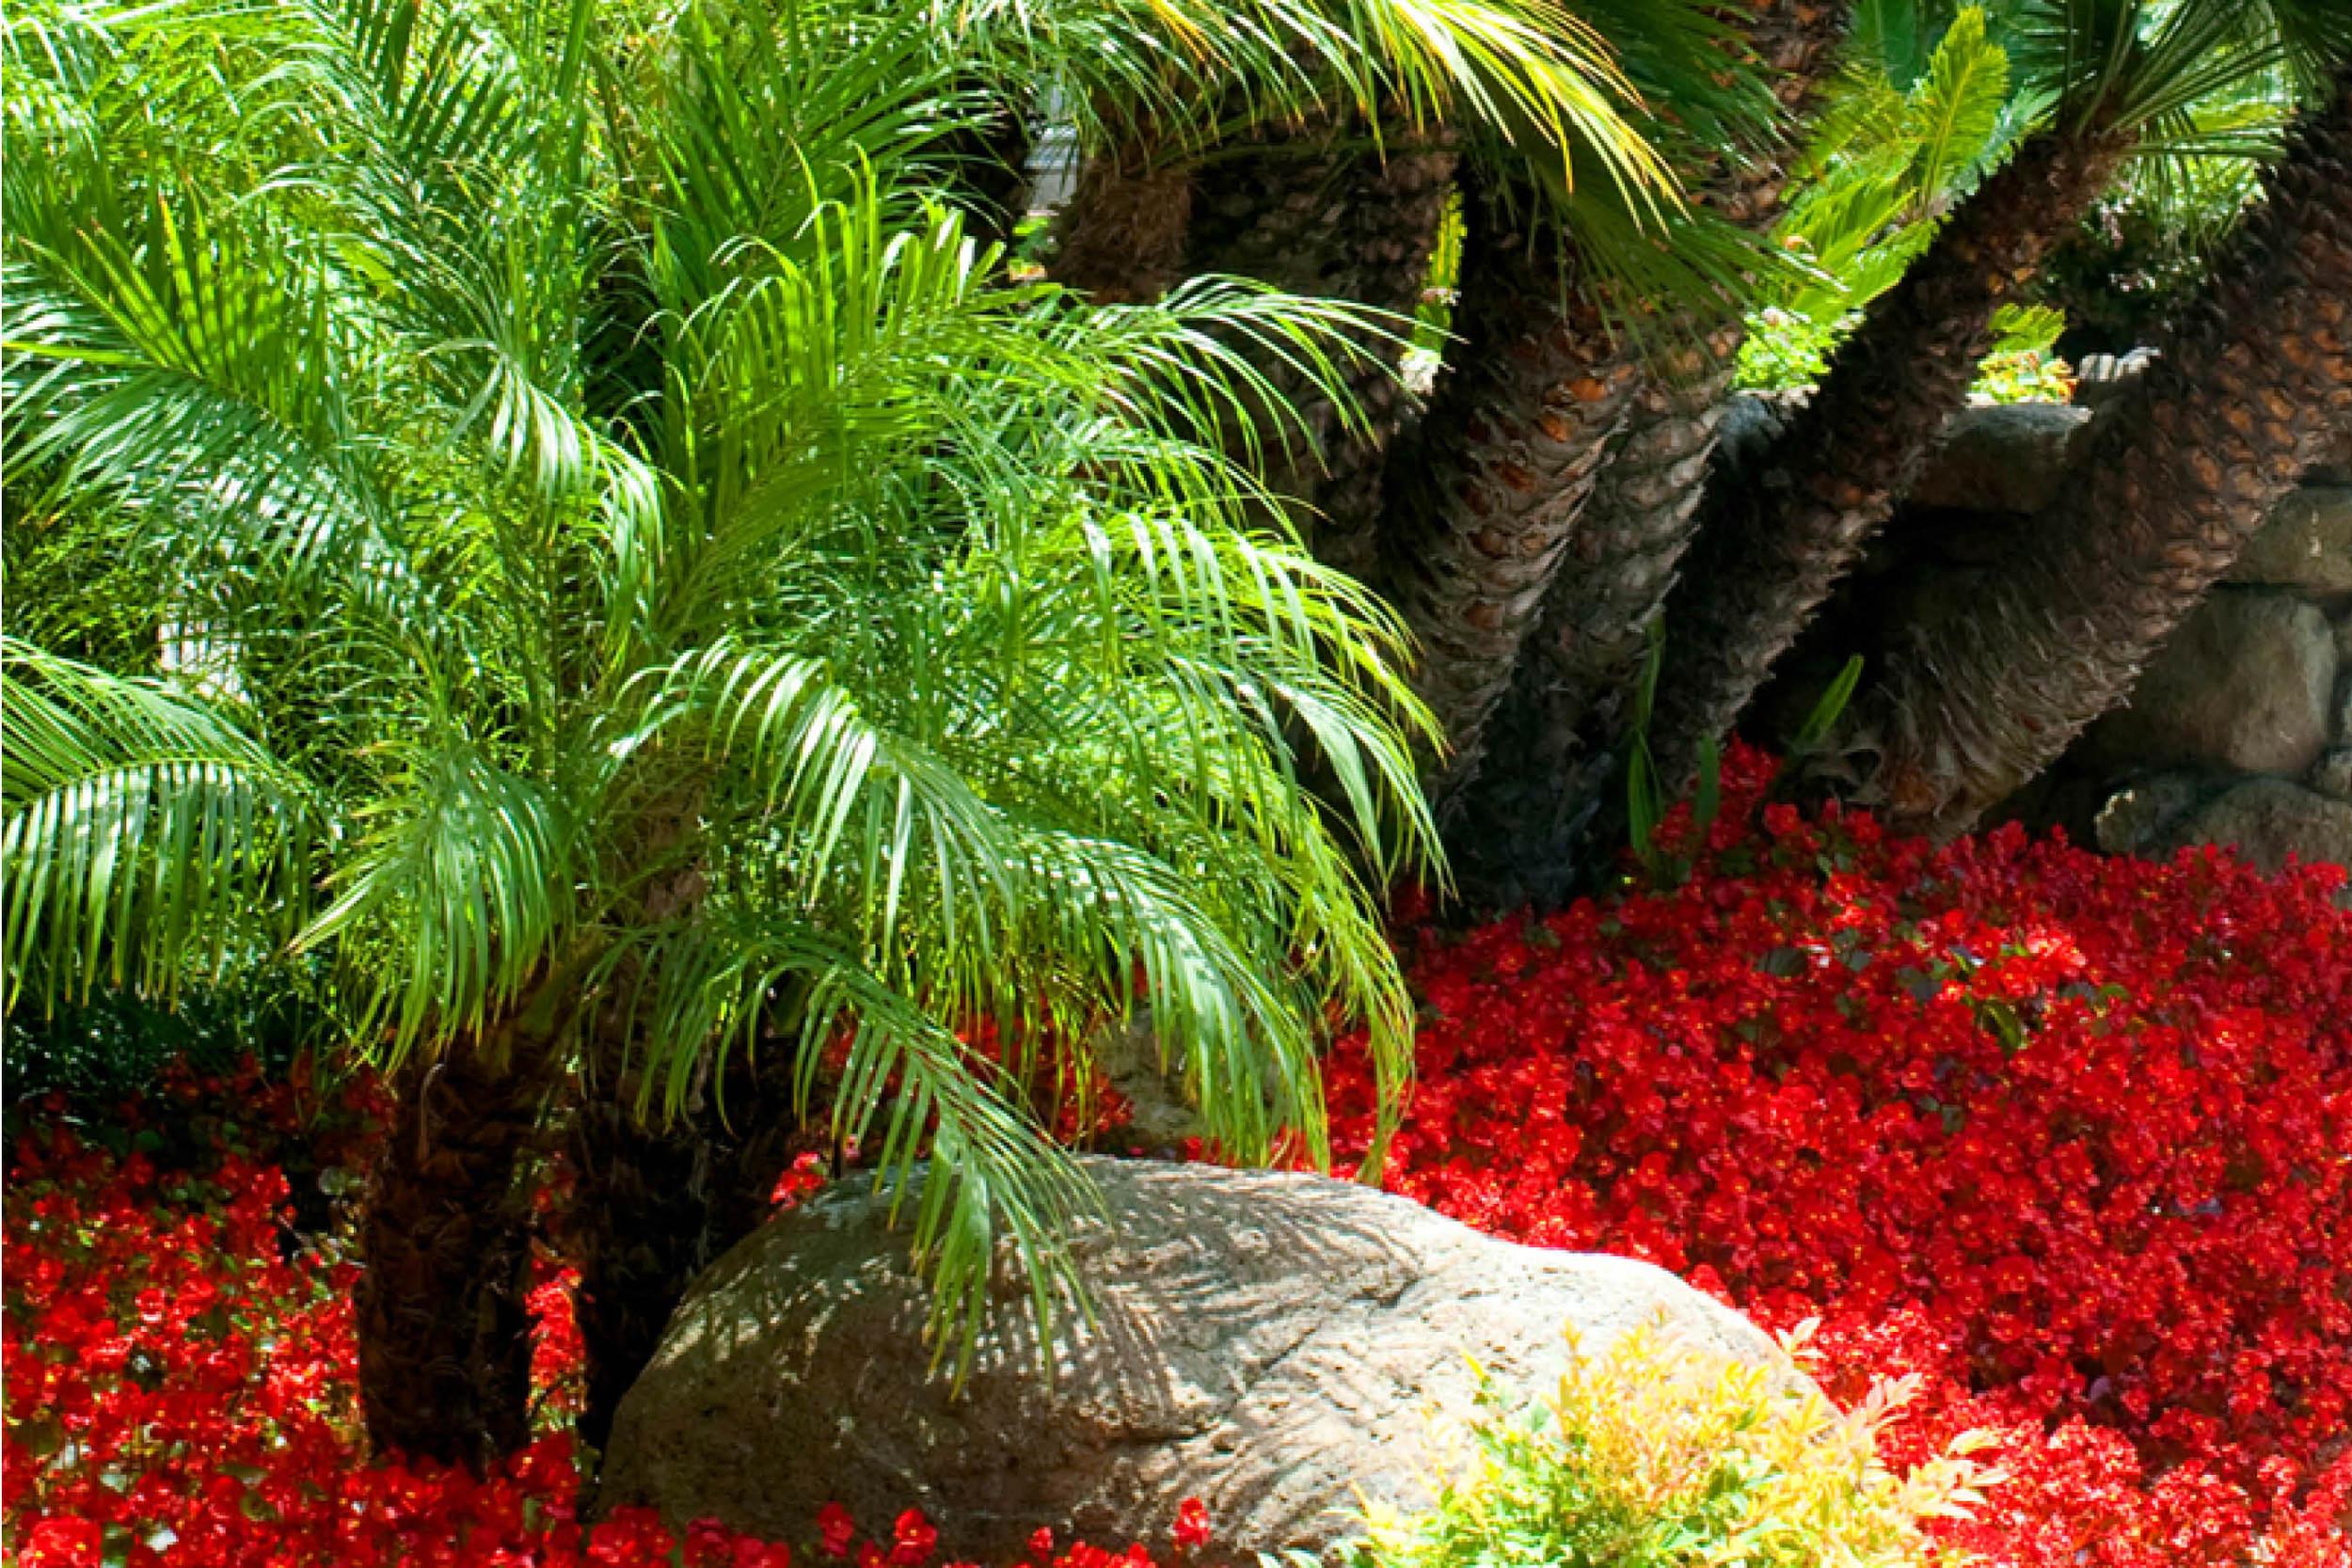 the-village-gardener-home-staging-plants-patio-decor-maintenance-interior-orchids-santa-barbara-carpinteria-losangeles-pasadena-santaynez  (5).jpg